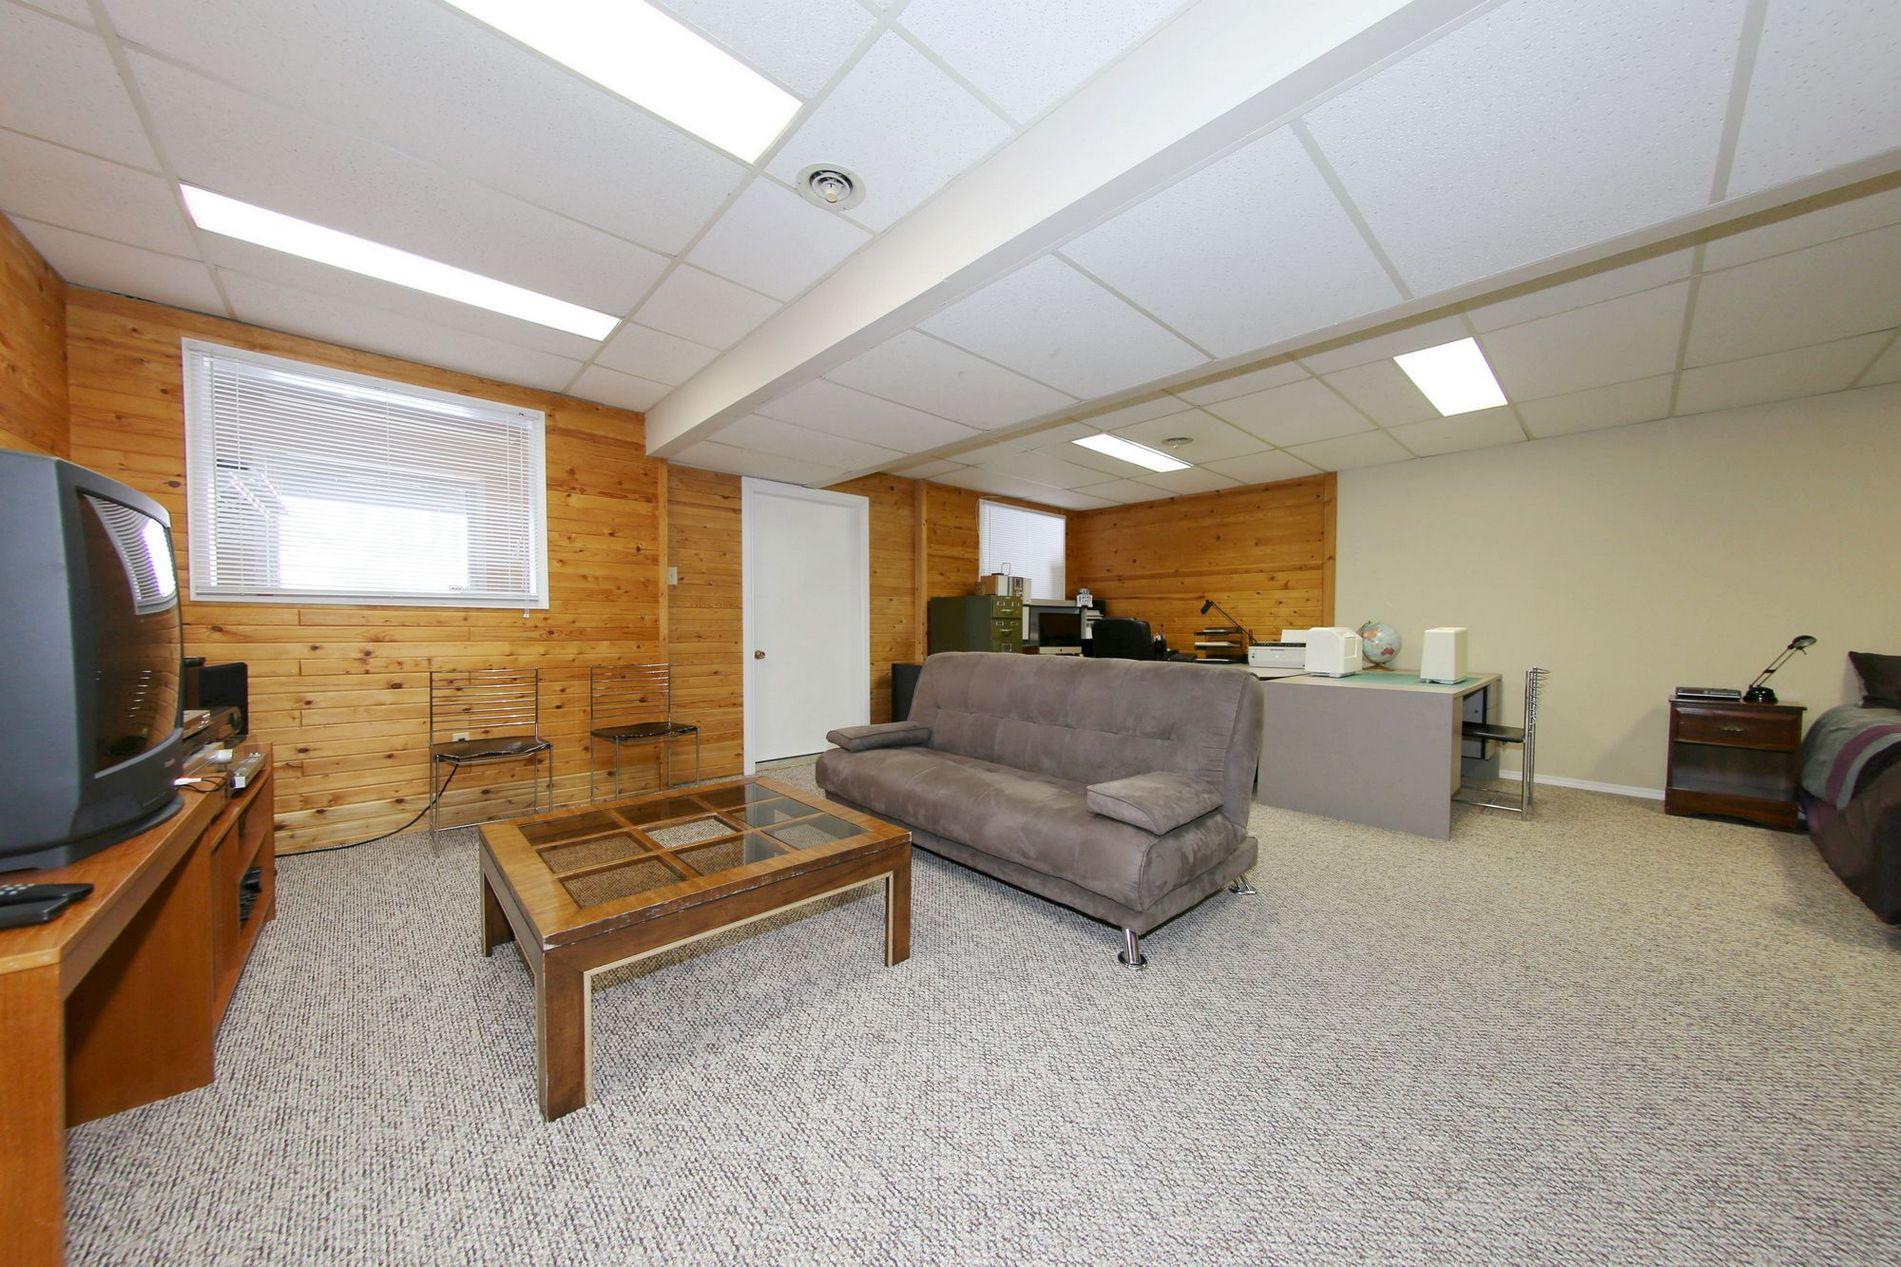 6383 Southboine Drive, Winnipeg, Manitoba  R3R 0B7 - Photo 23 - 1504061